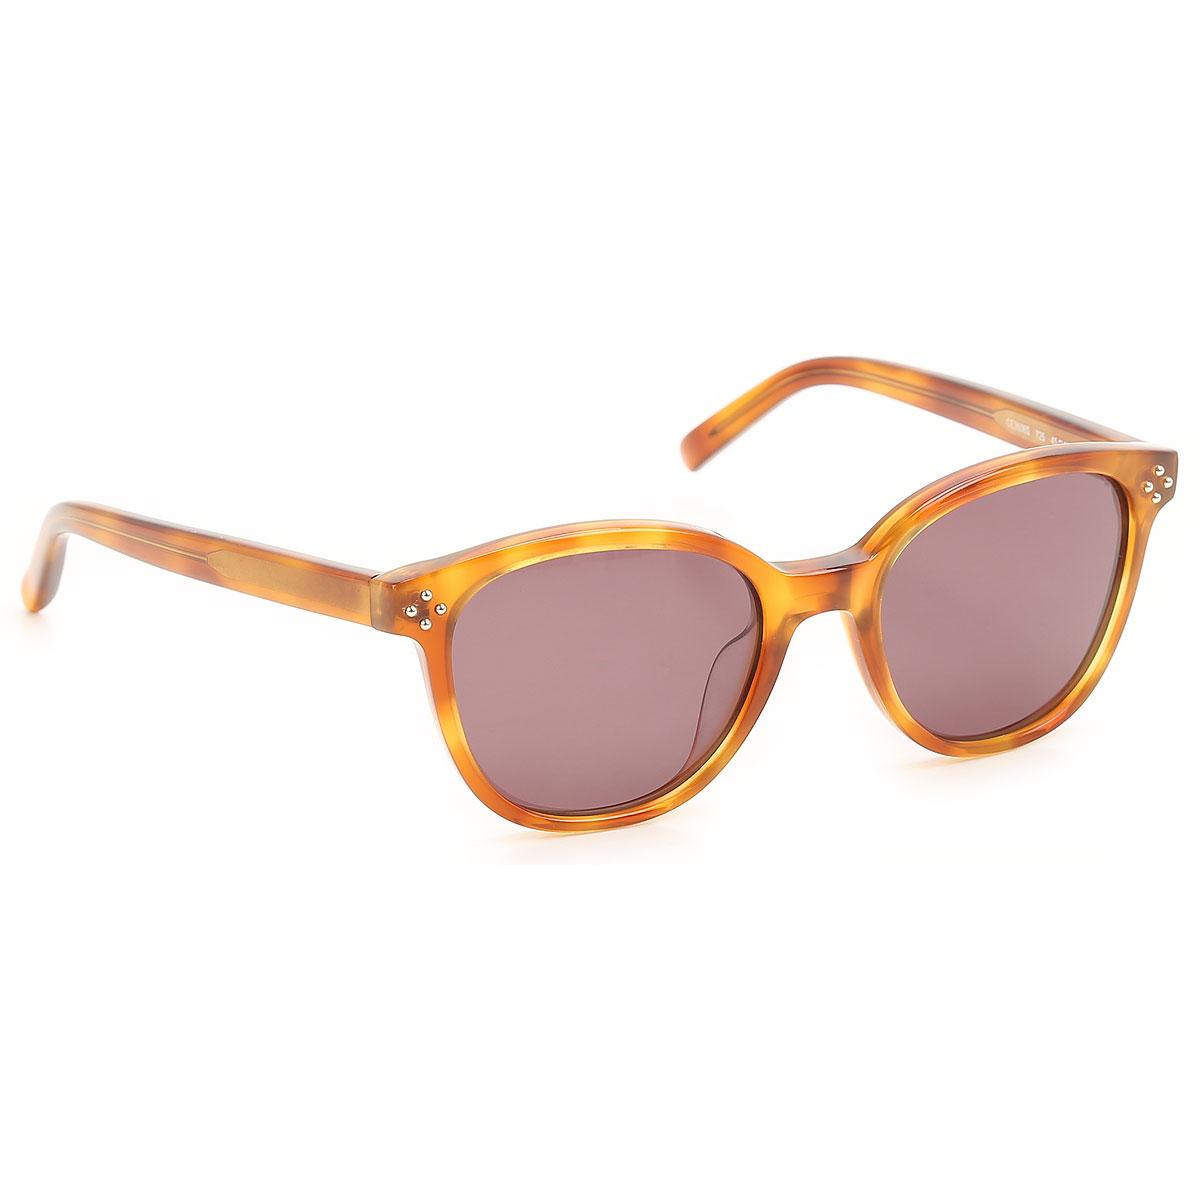 Image of Chloe Kids Sunglasses for Girls On Sale, Havana, 2017